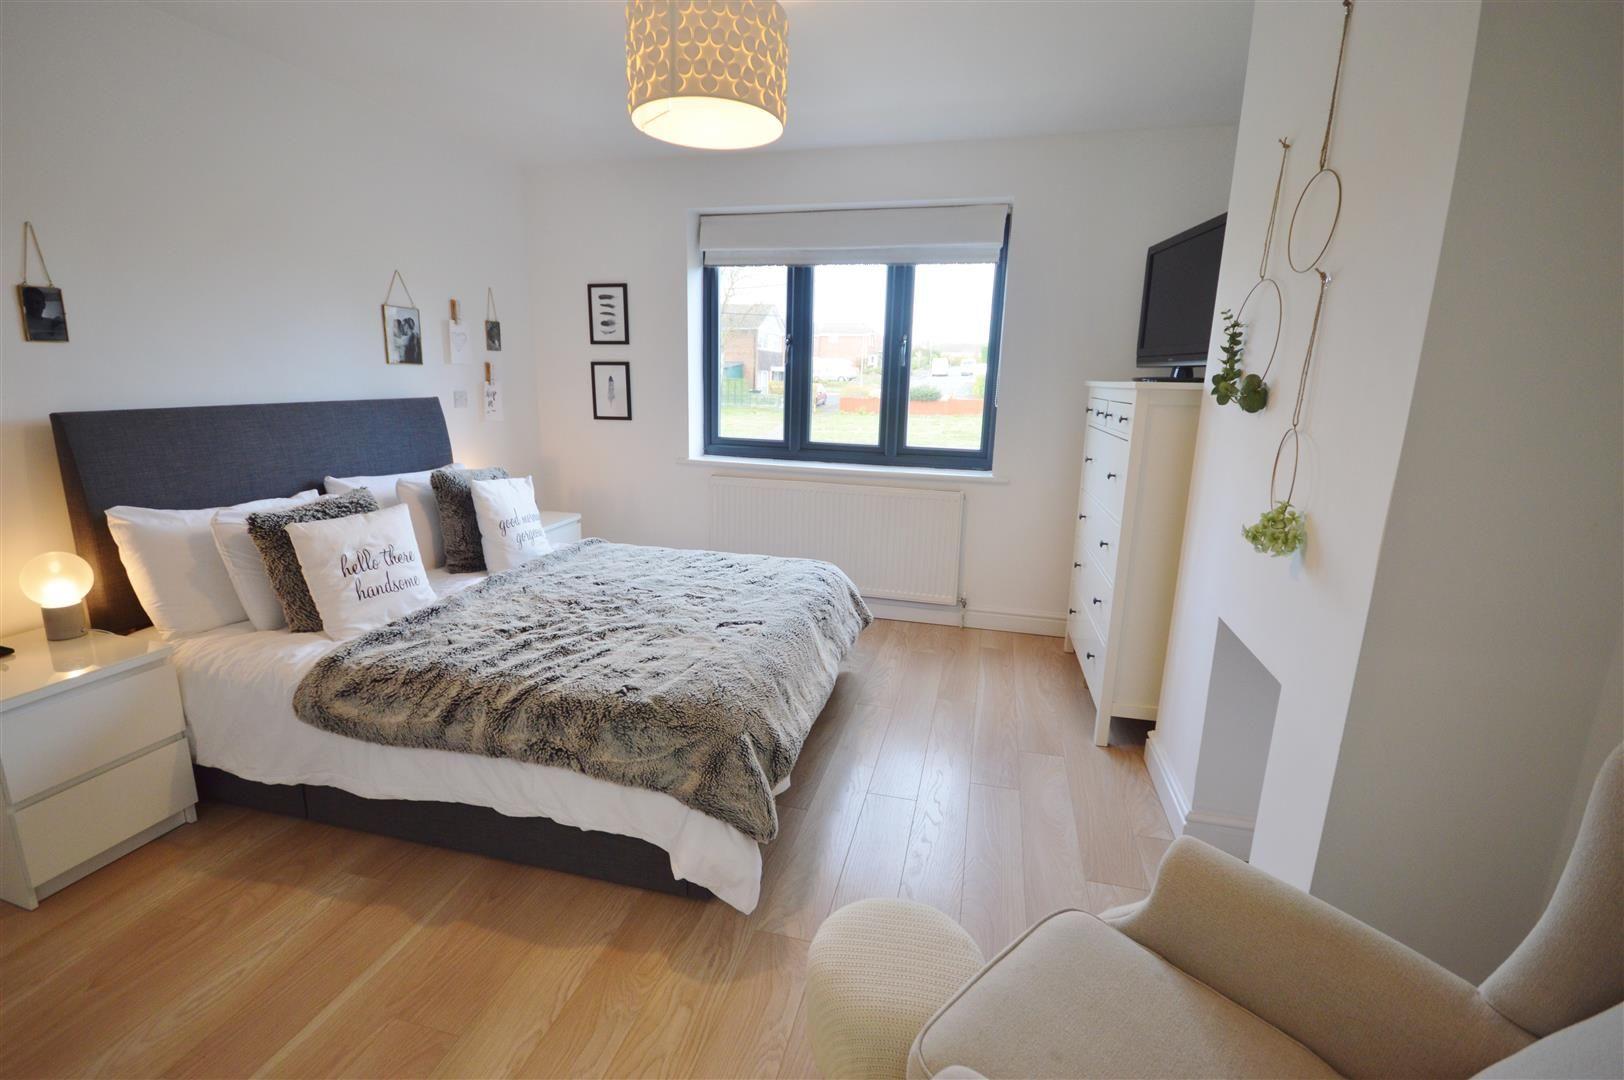 5 bed detached for sale in Leominster  - Property Image 9